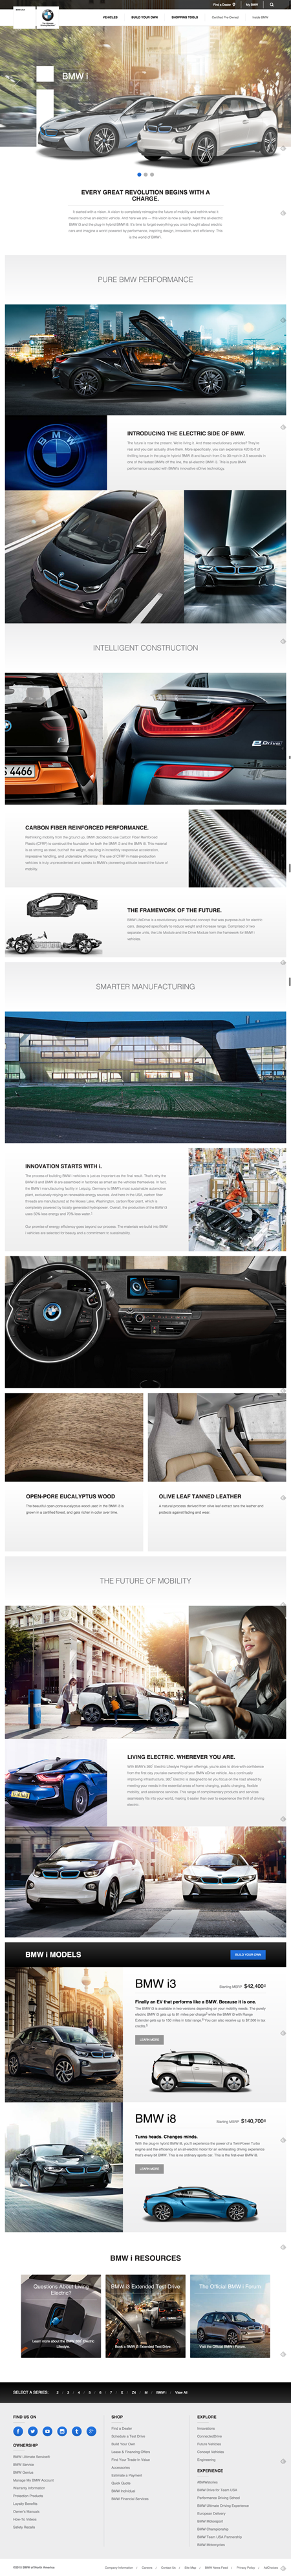 BMWi.png